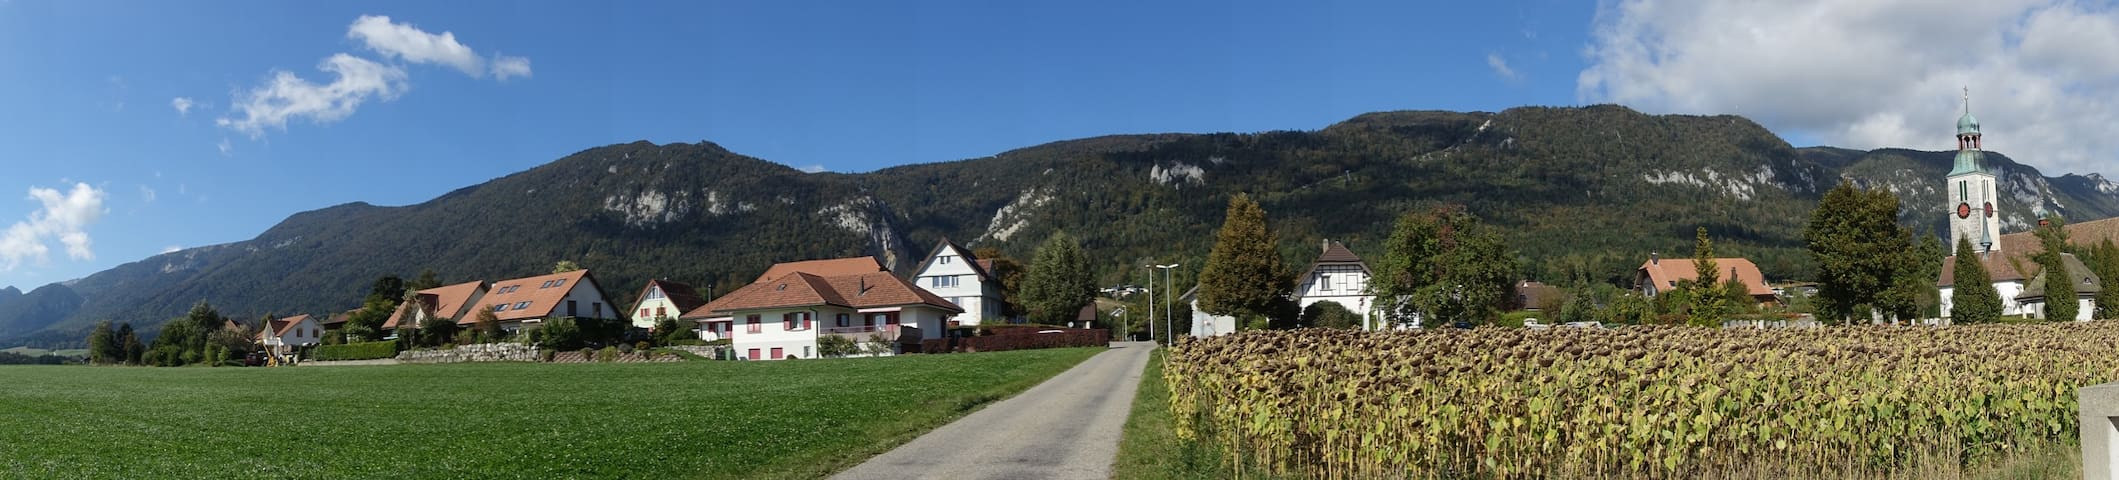 Swiss village apartment with breathtaking views - Oberdorf